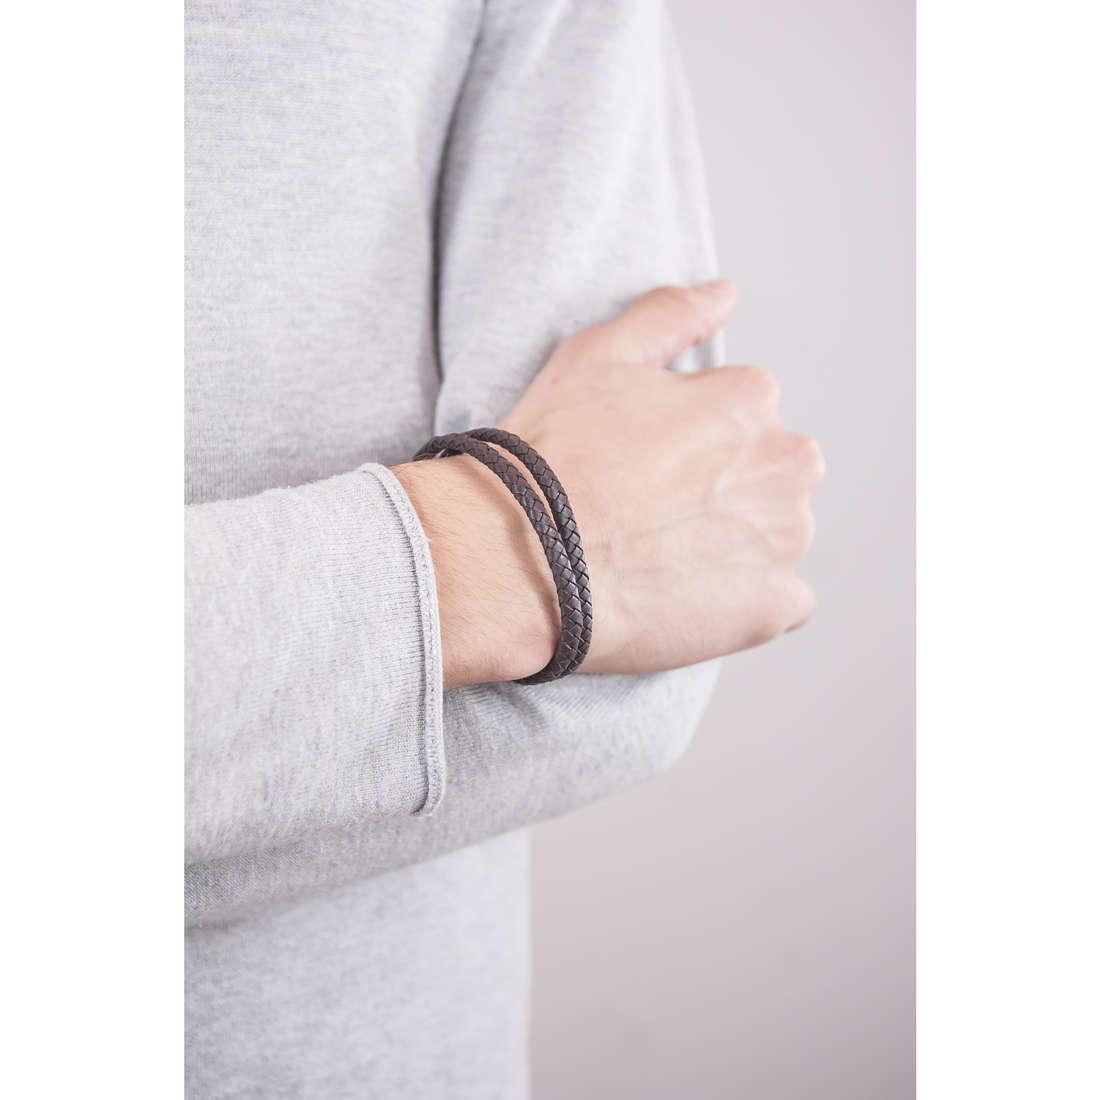 Emporio Armani bracelets Signature man EGS2177221 indosso